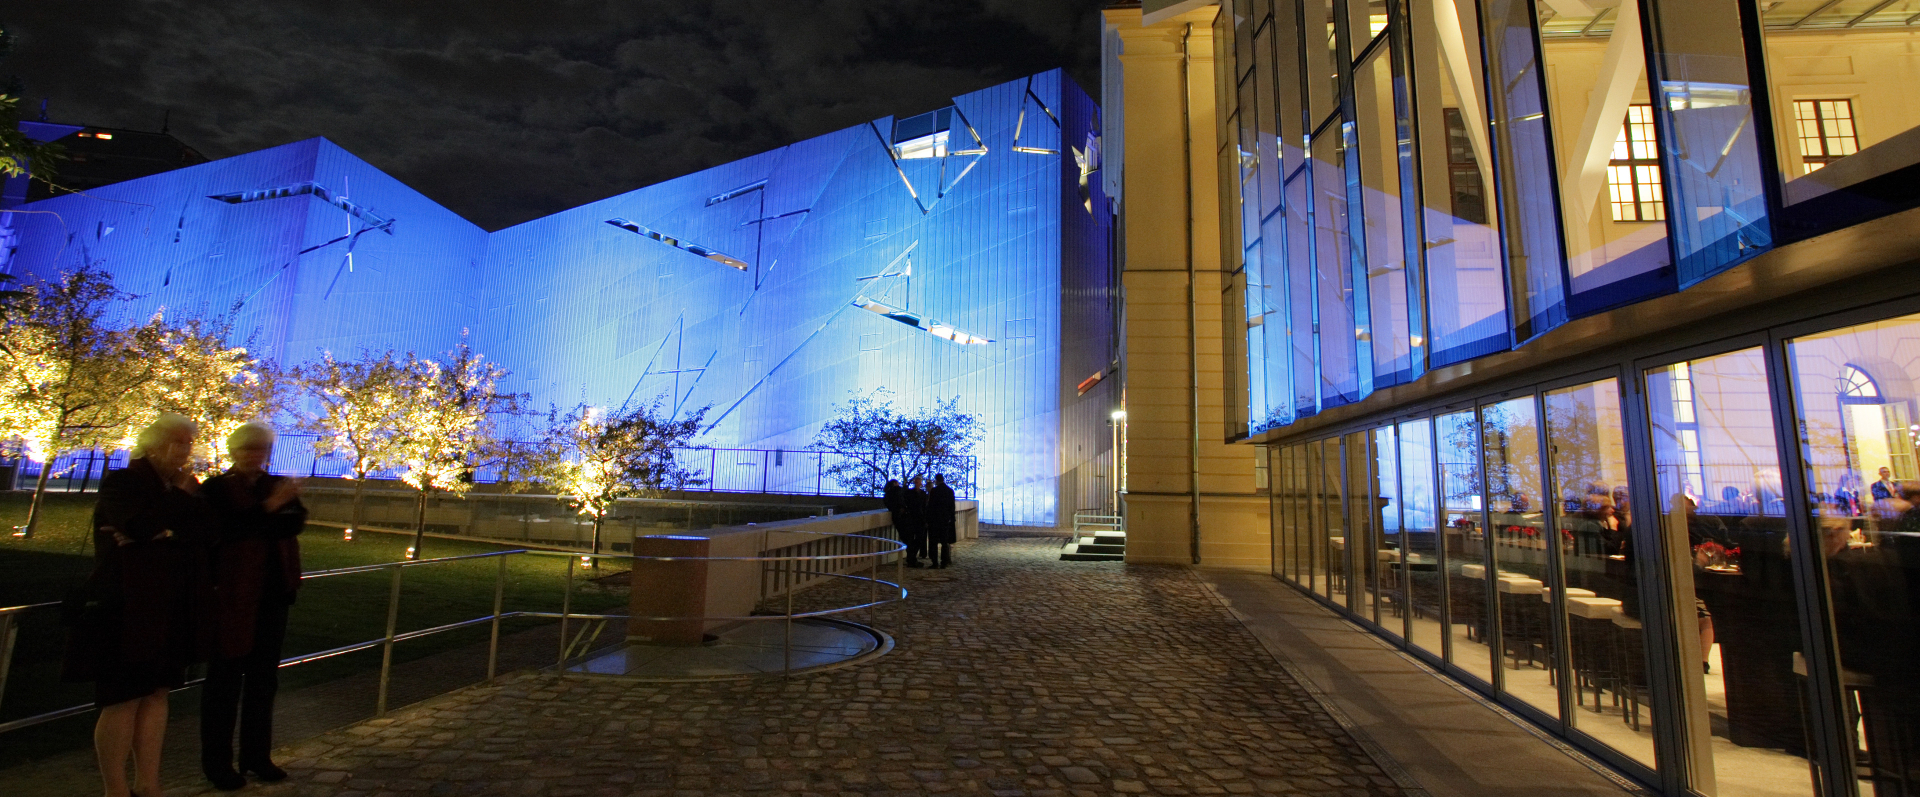 Libeskindbau und Glashof bei Nacht (angestrahlt)